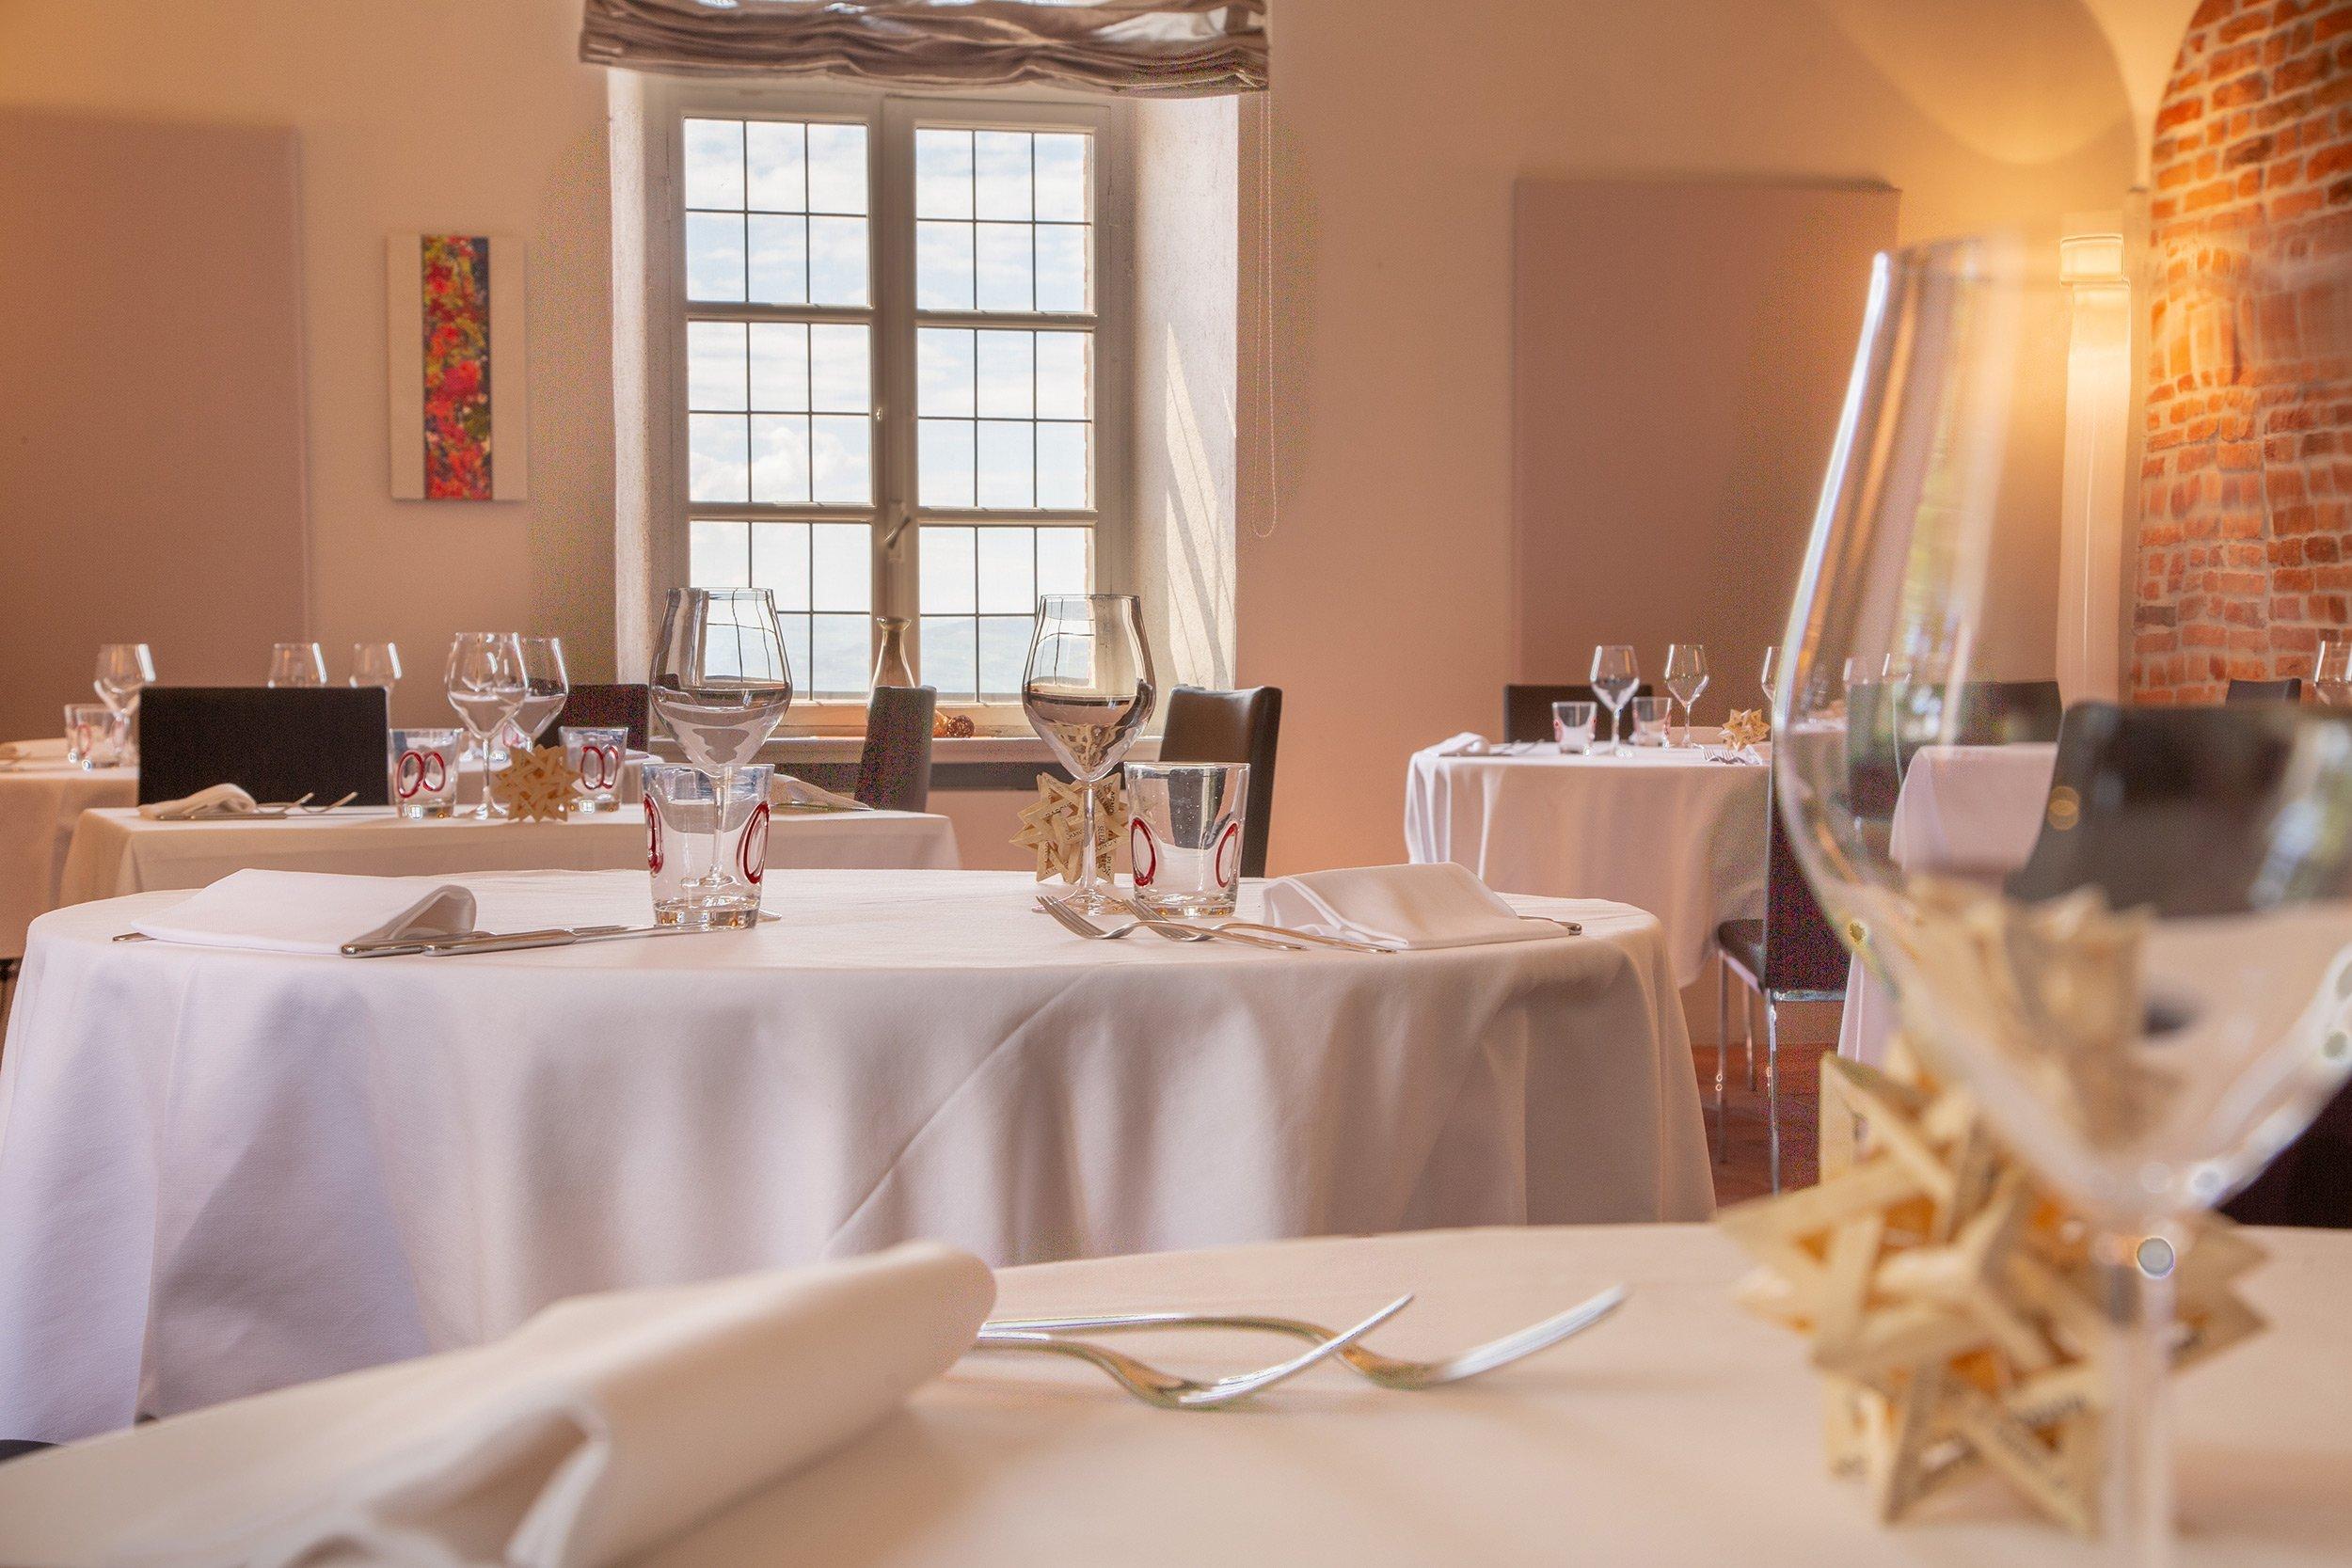 The restaurant room - Hotel Castello Santa Vittoria